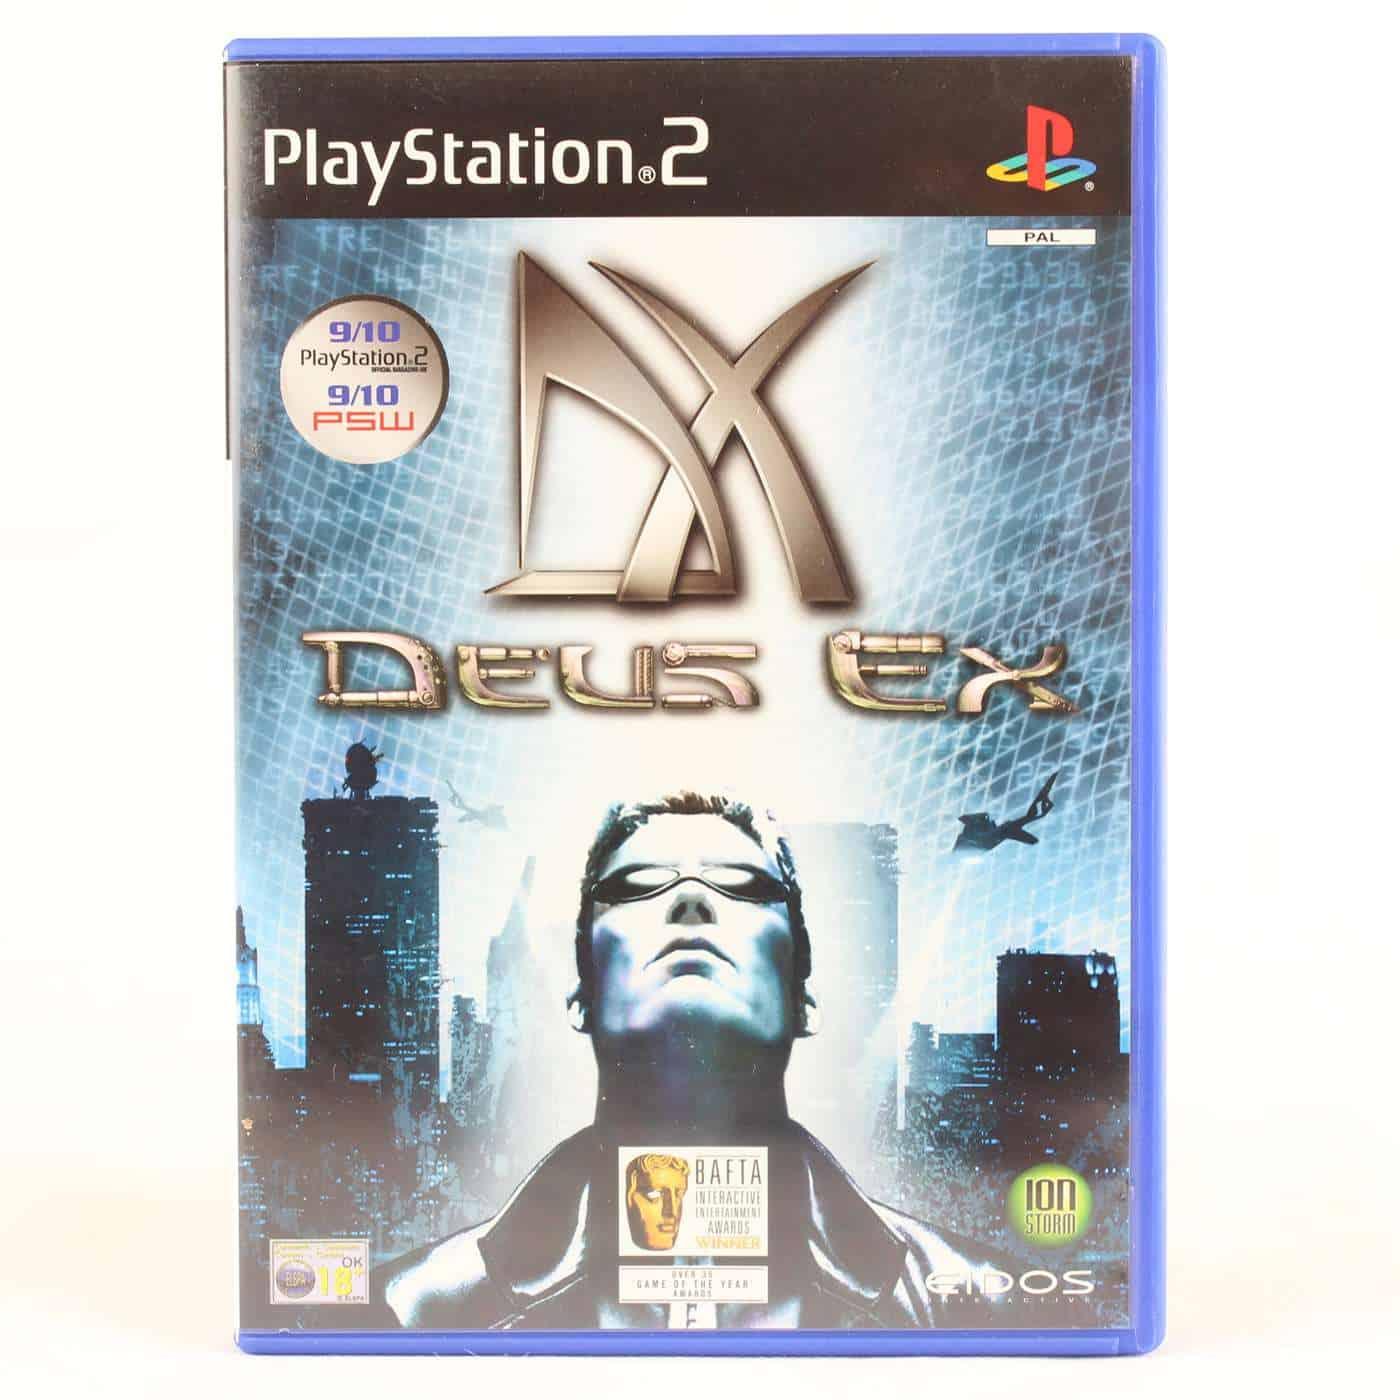 Deus Ex (Playstation 2